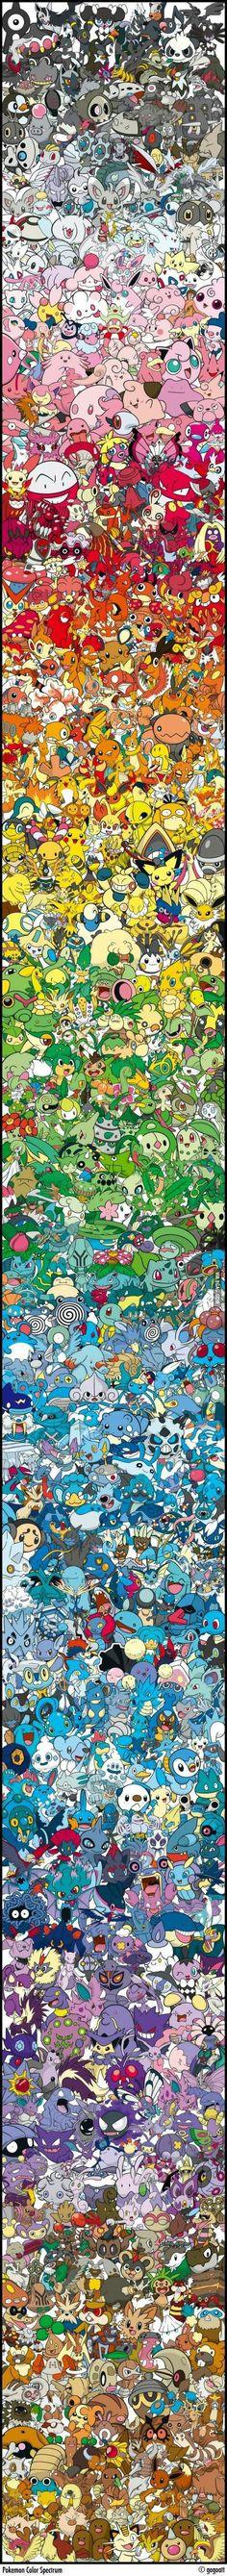 Every Pokemon colour sorted - 9GAG